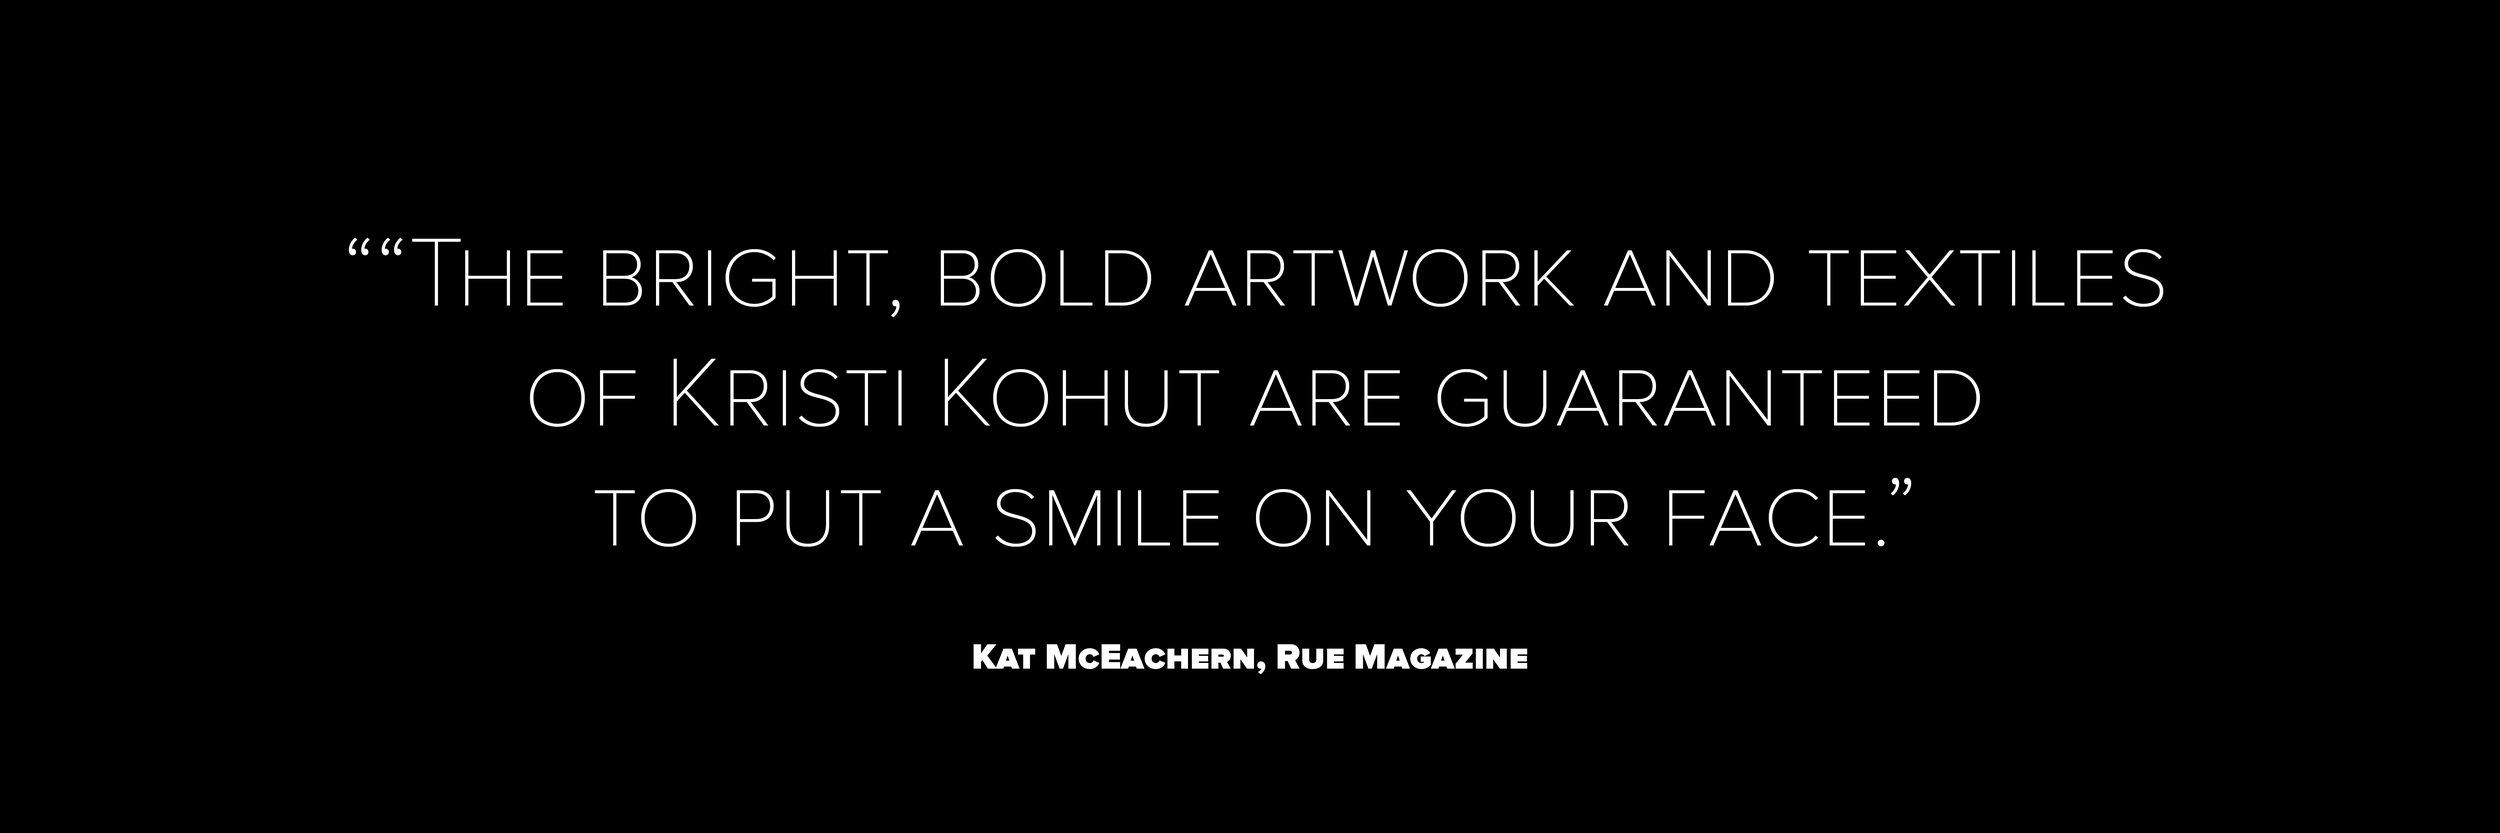 Copy of Kristi Kohut Happy Interiors